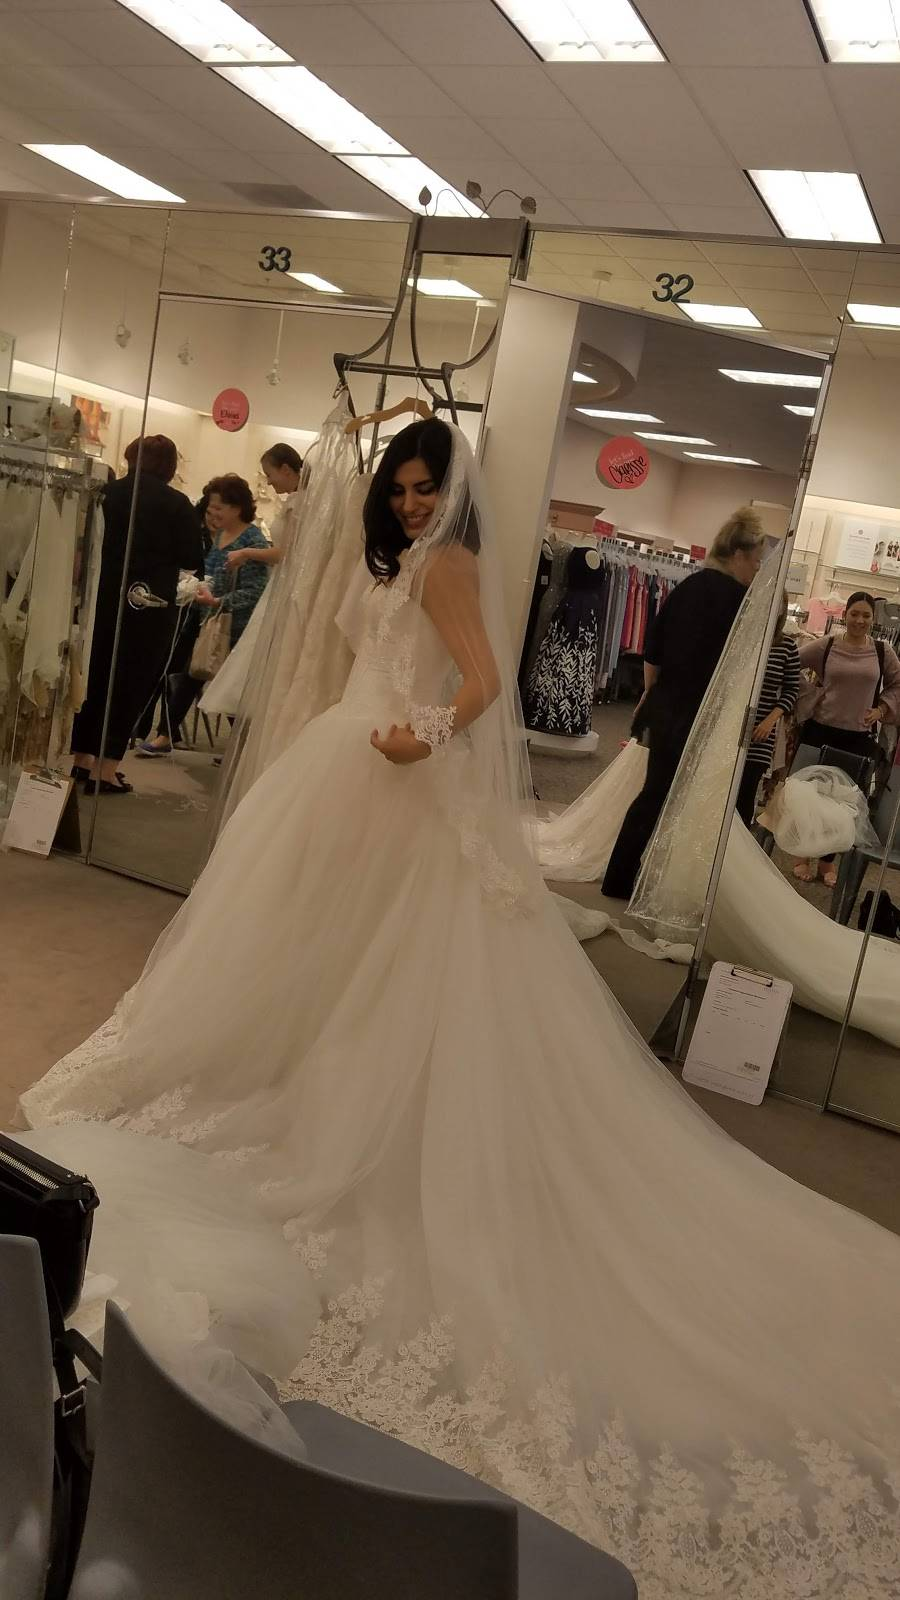 David's Bridal - shoe store  | Photo 2 of 9 | Address: 980 Camino De La Reina Suite A, San Diego, CA 92108, USA | Phone: (619) 220-8008